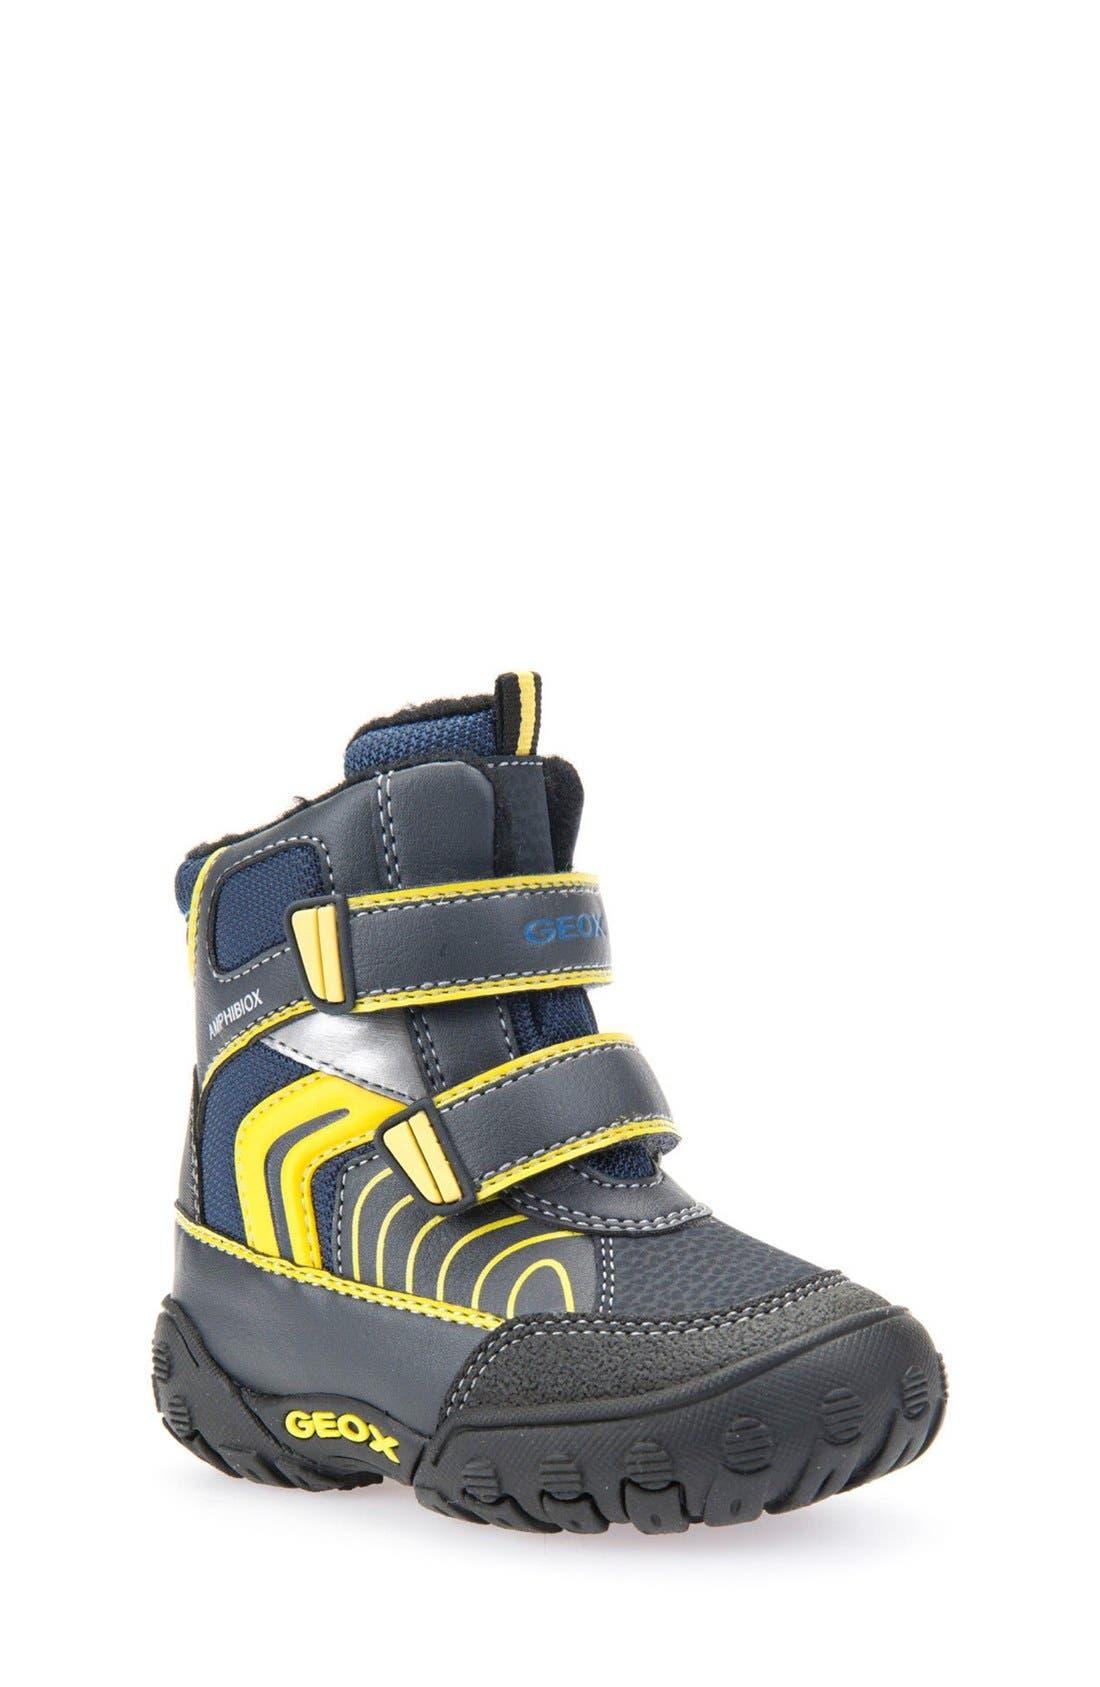 Geox 'Gulp' Waterproof Sneaker Boot (Walker & Toddler)